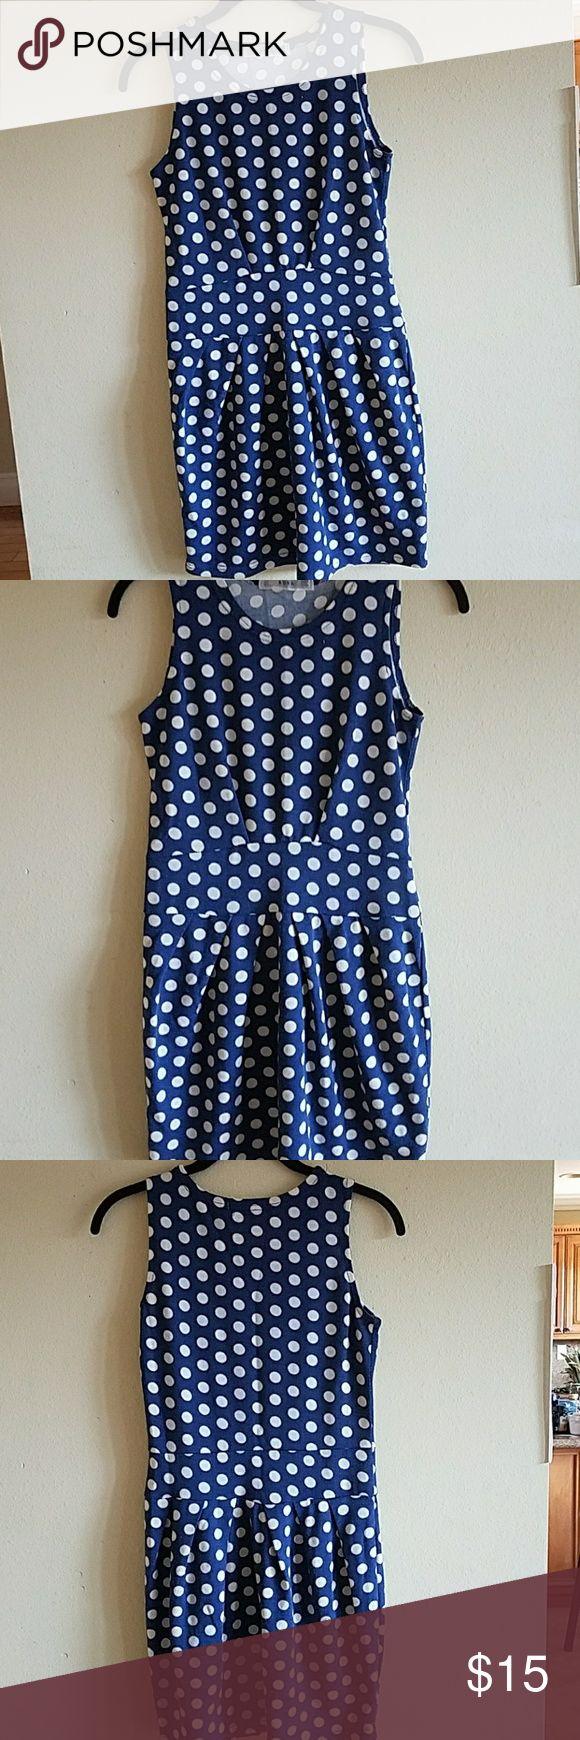 Summer Blue polka dot mini dress from Korea♡ lightweight polka dot mini dress from korea Dresses Mini